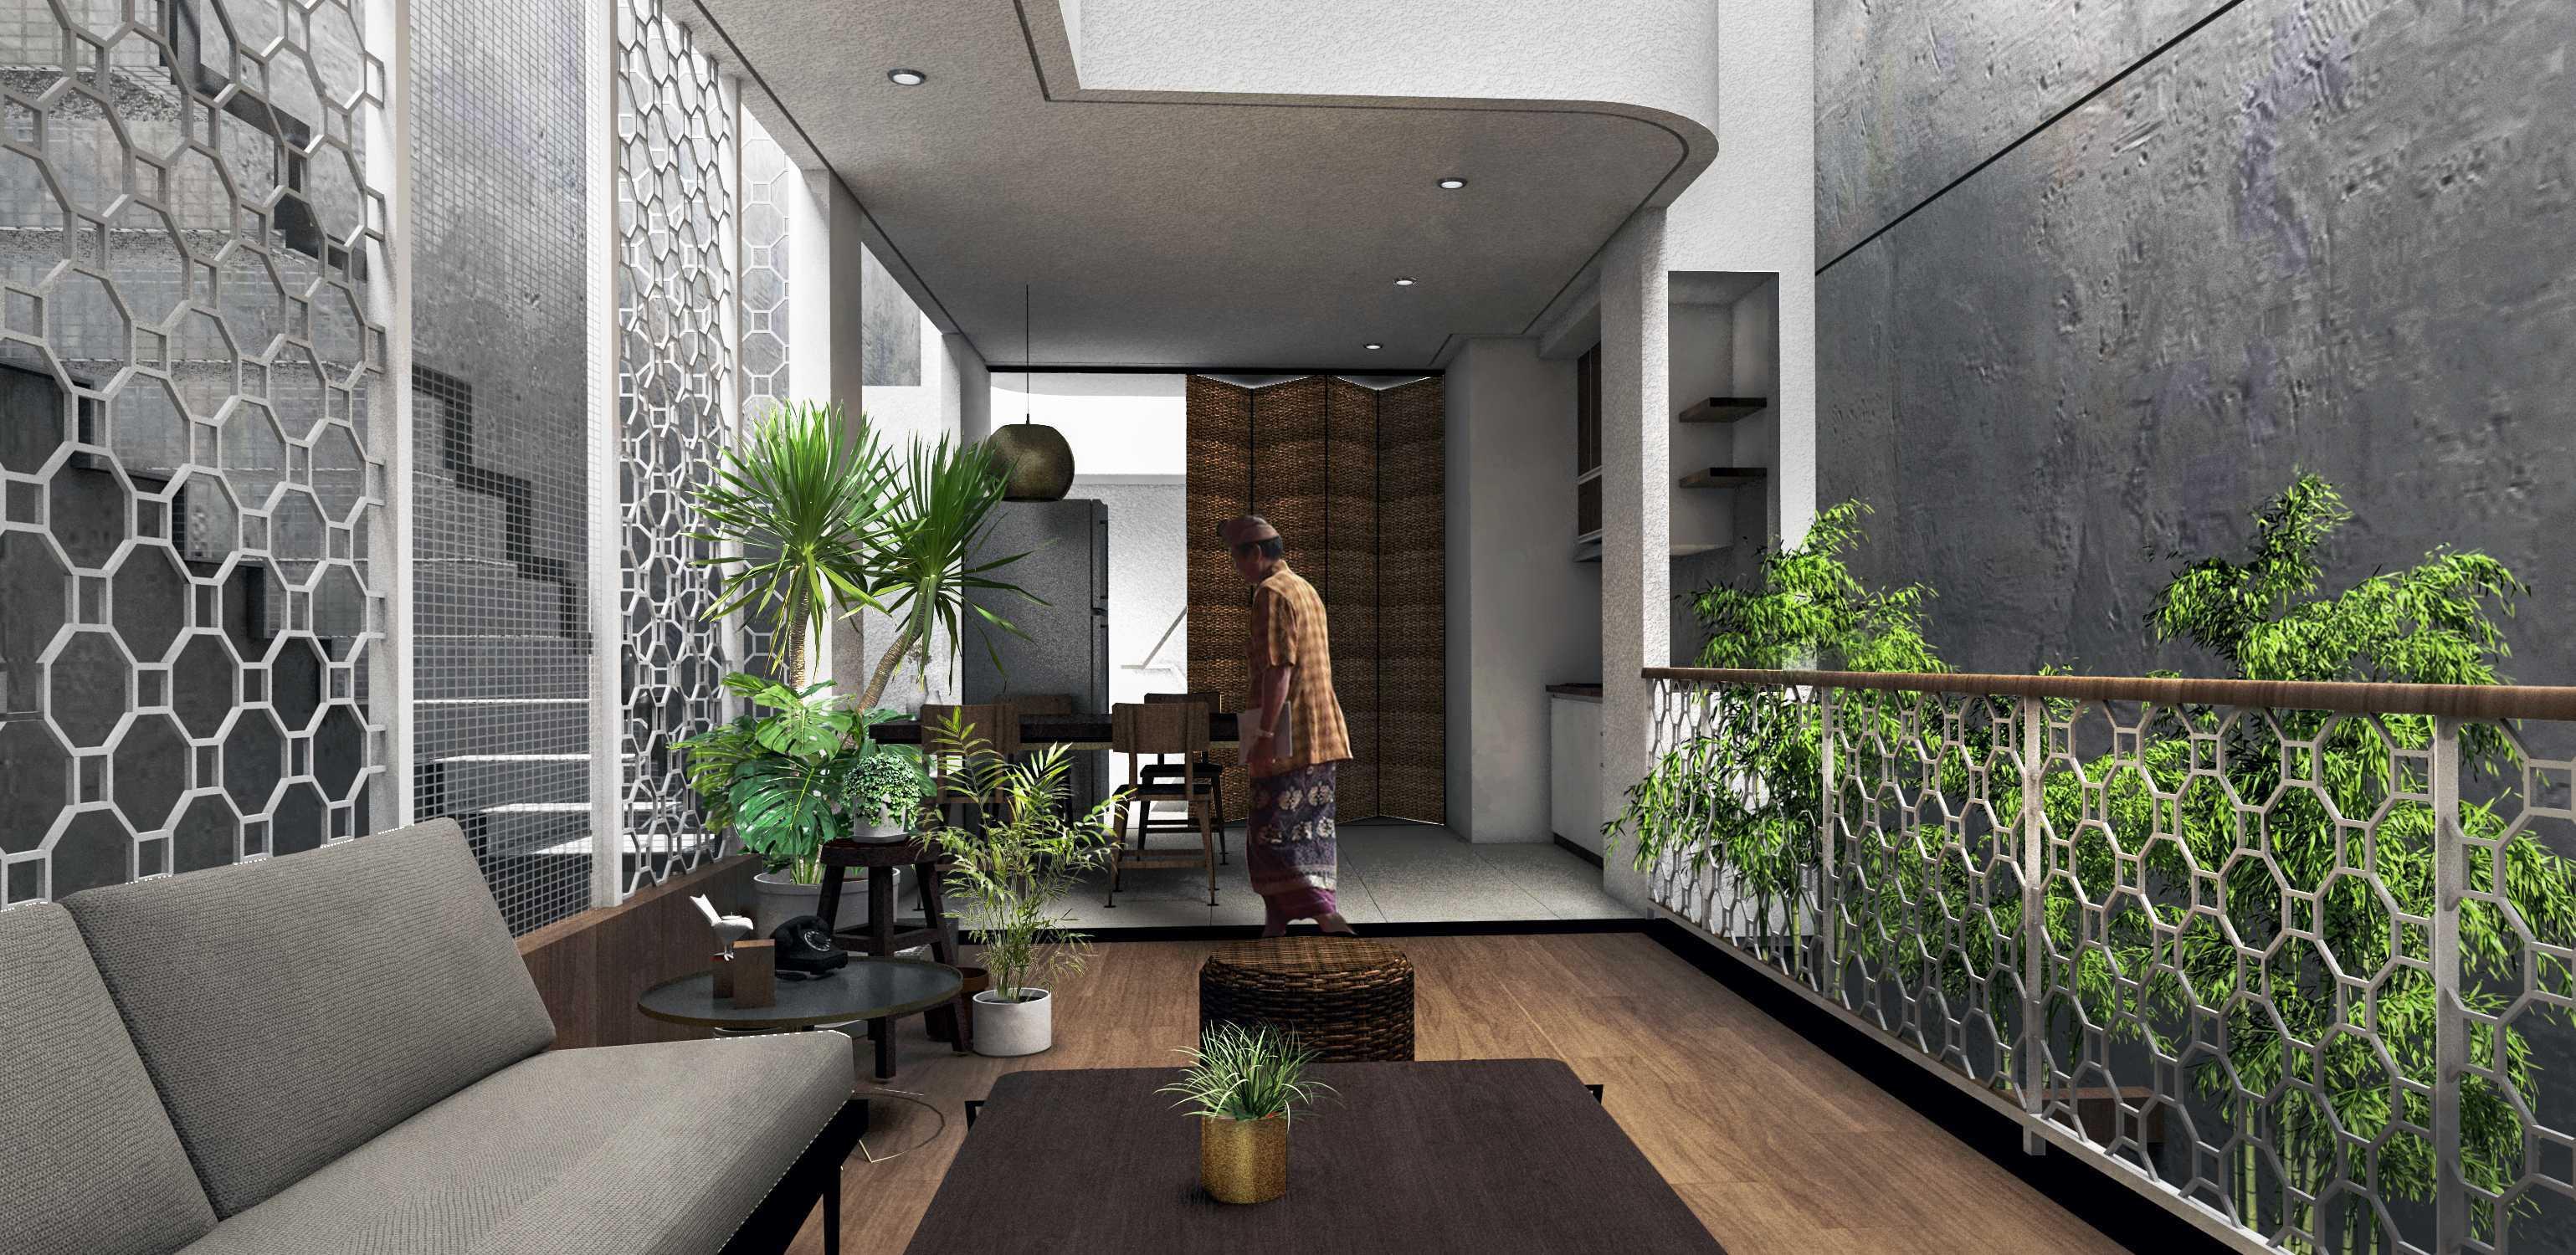 Arete Studio Uma Sengkedan Kota Denpasar, Bali, Indonesia Kota Denpasar, Bali, Indonesia Living Room   46408